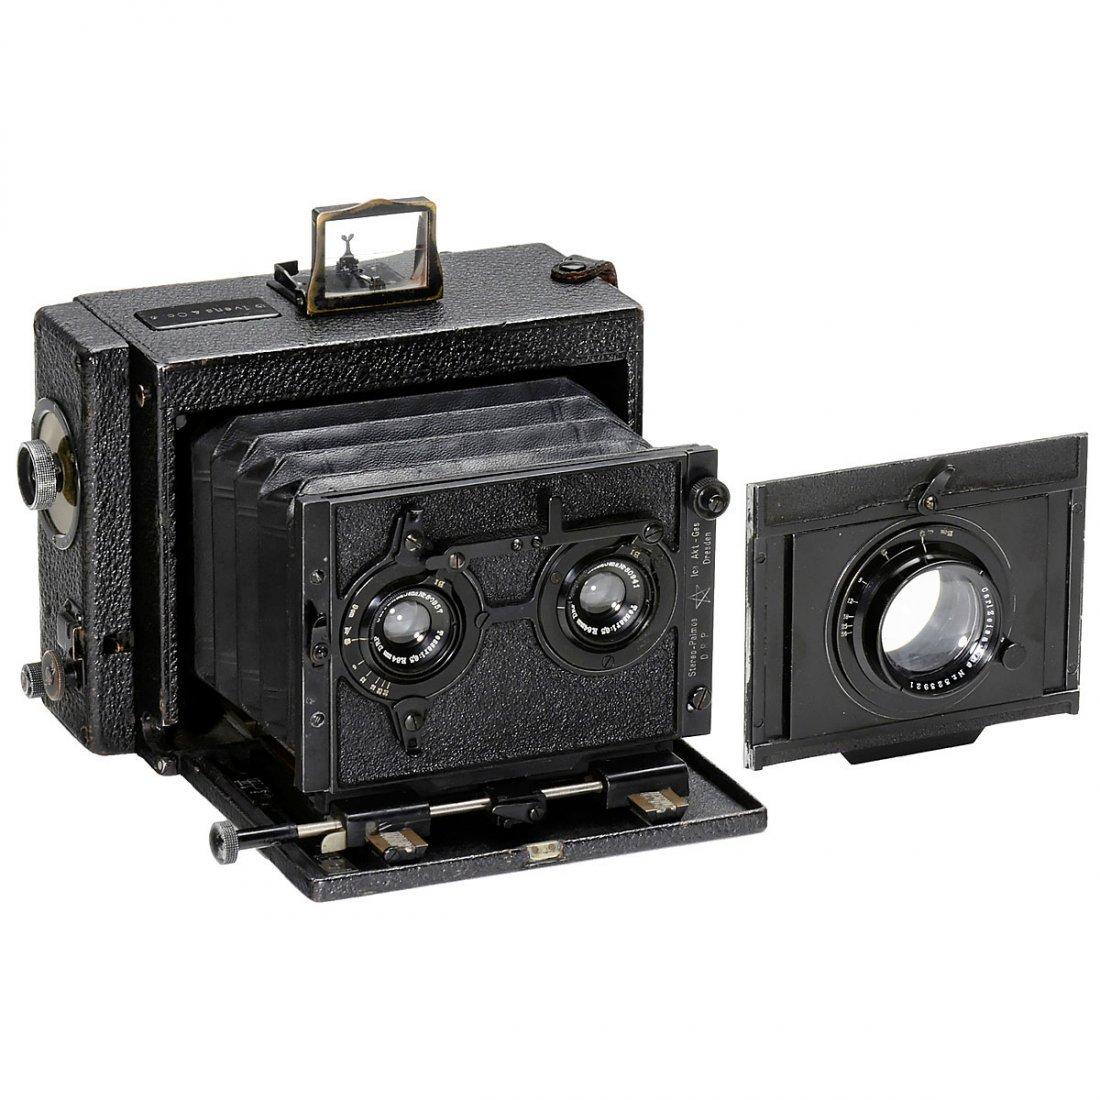 Ica Stereo-Klapp-Palmos 9 x 12, 1912